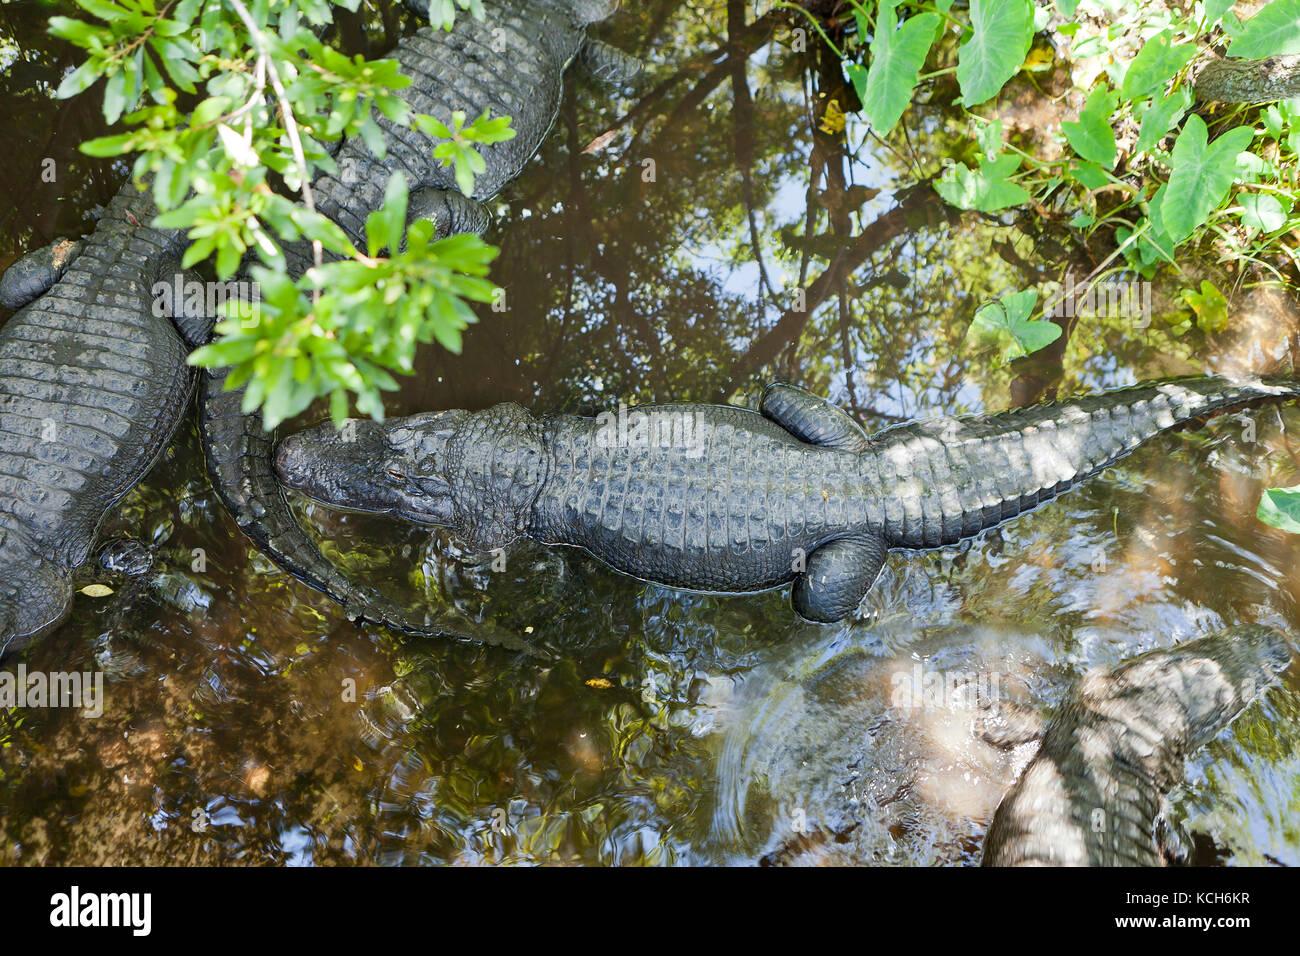 Adult American alligators (Alligator mississippiensis) basking in sun at Gatorland - Orlando, Florida USA - Stock Image